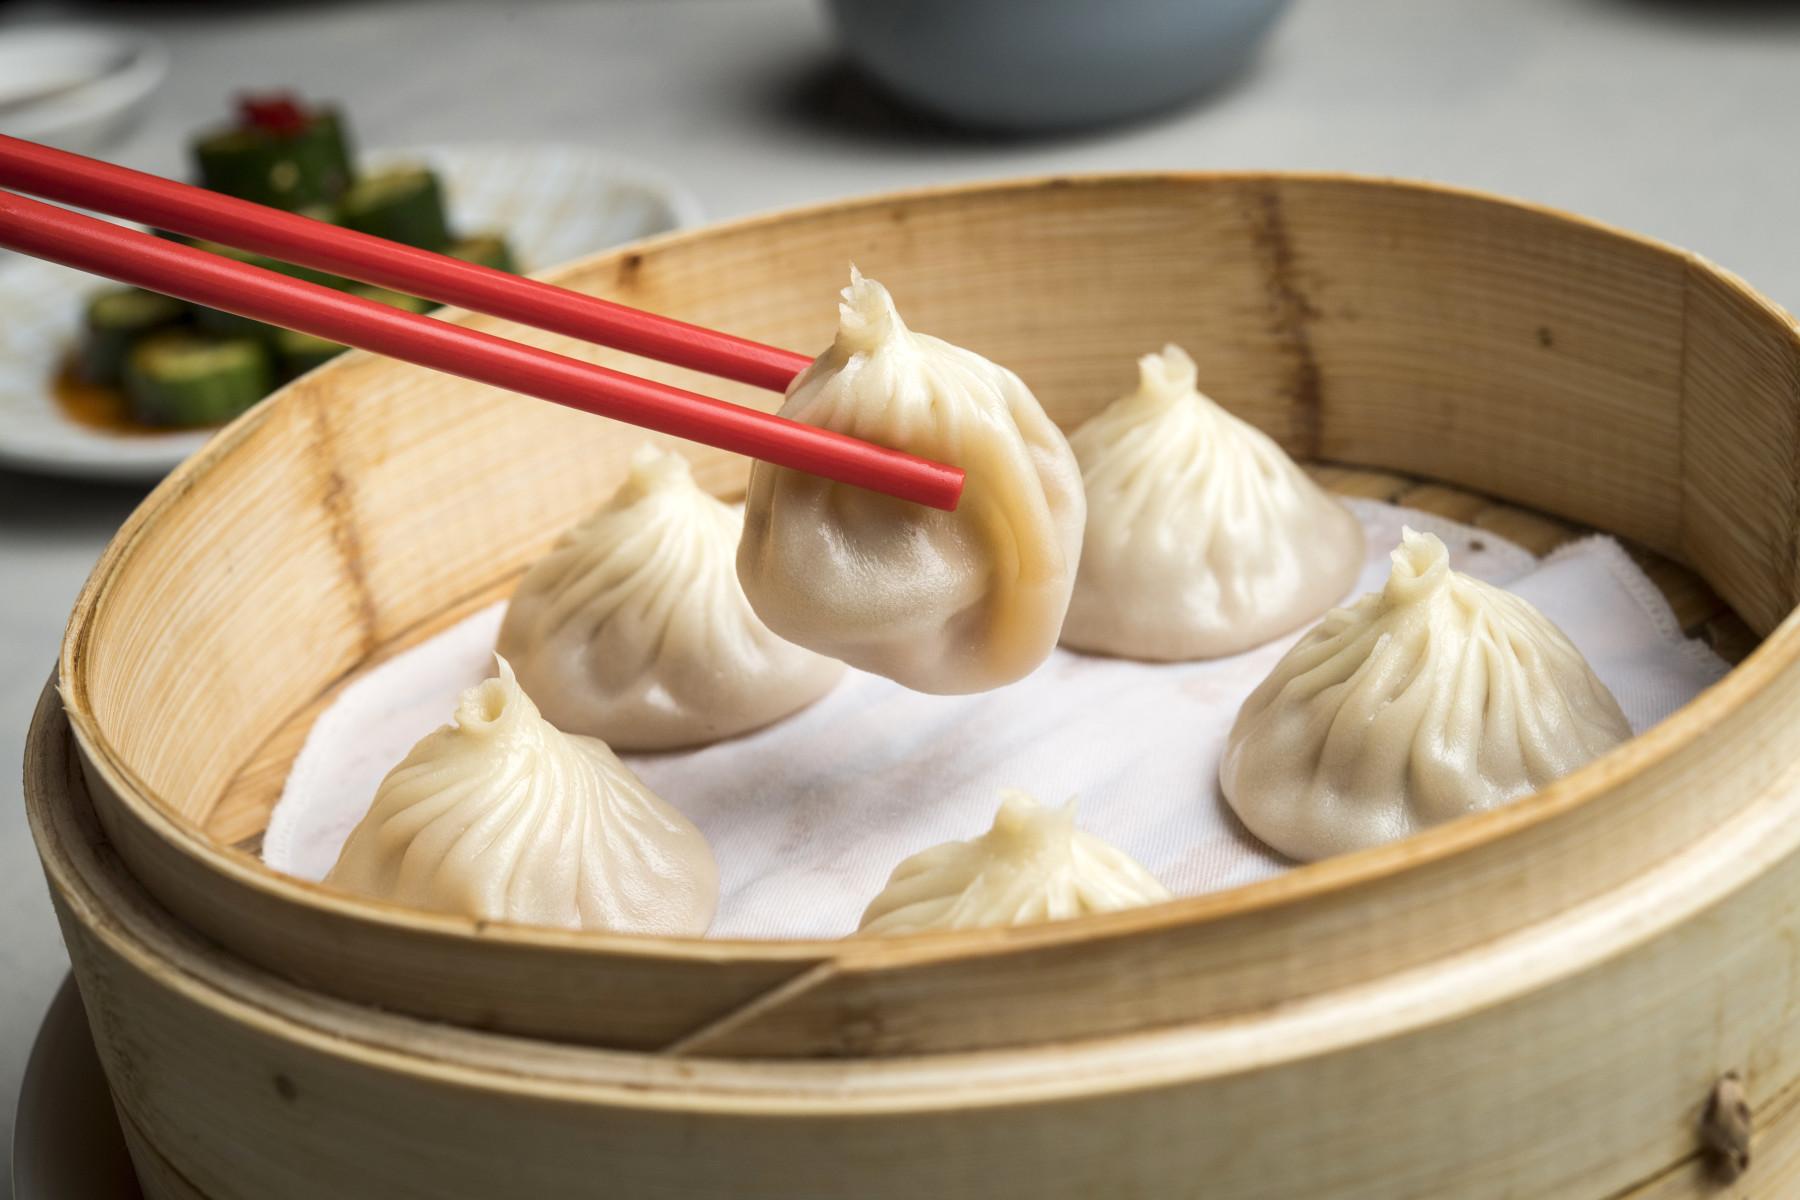 Pinch Chinese -Dumplings - Feast Meets West